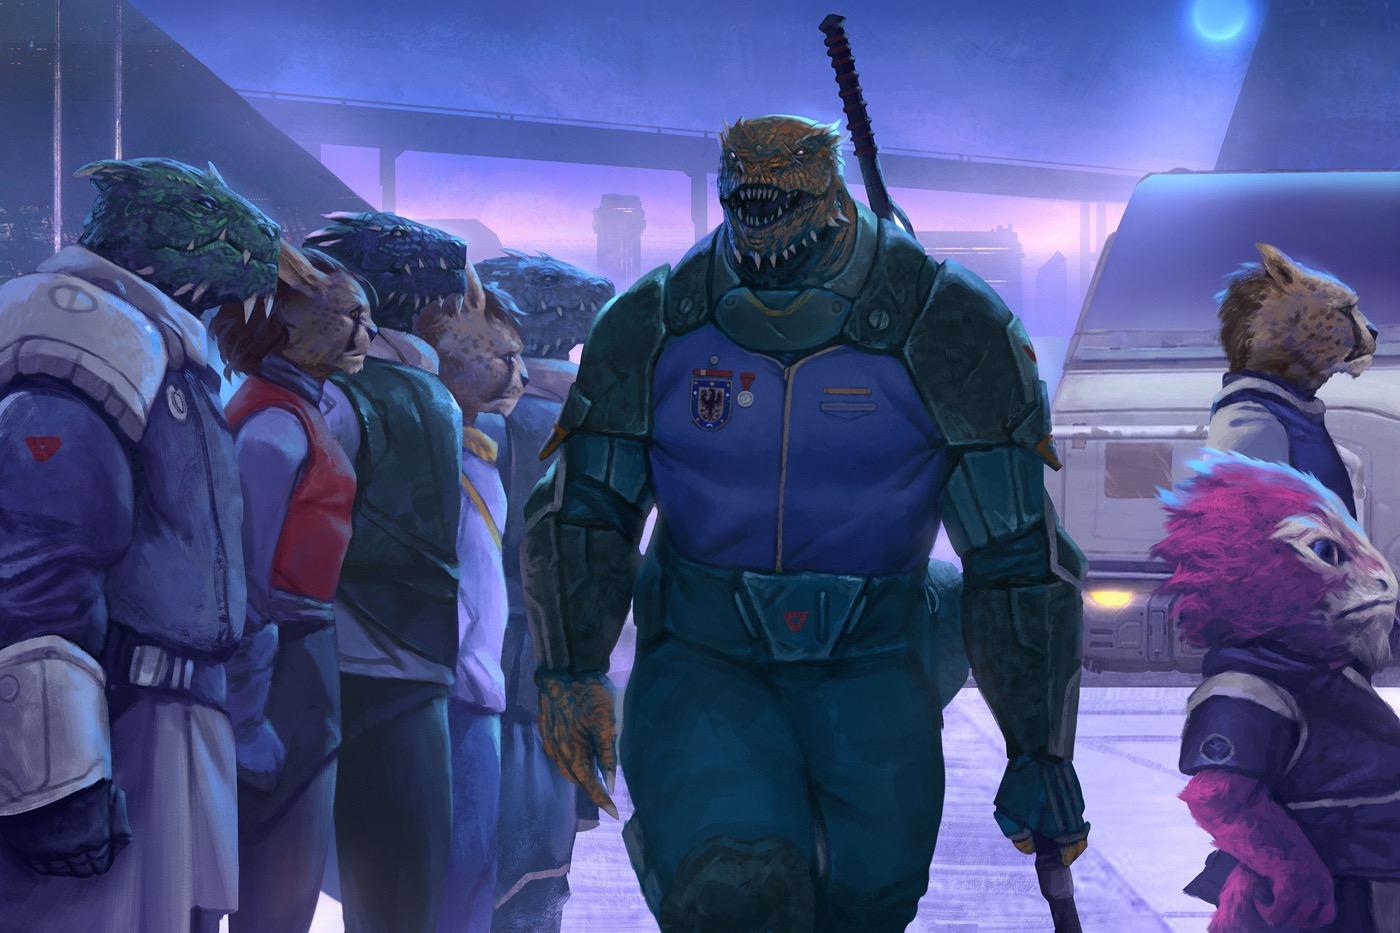 A vesk recruiter and alien recruits